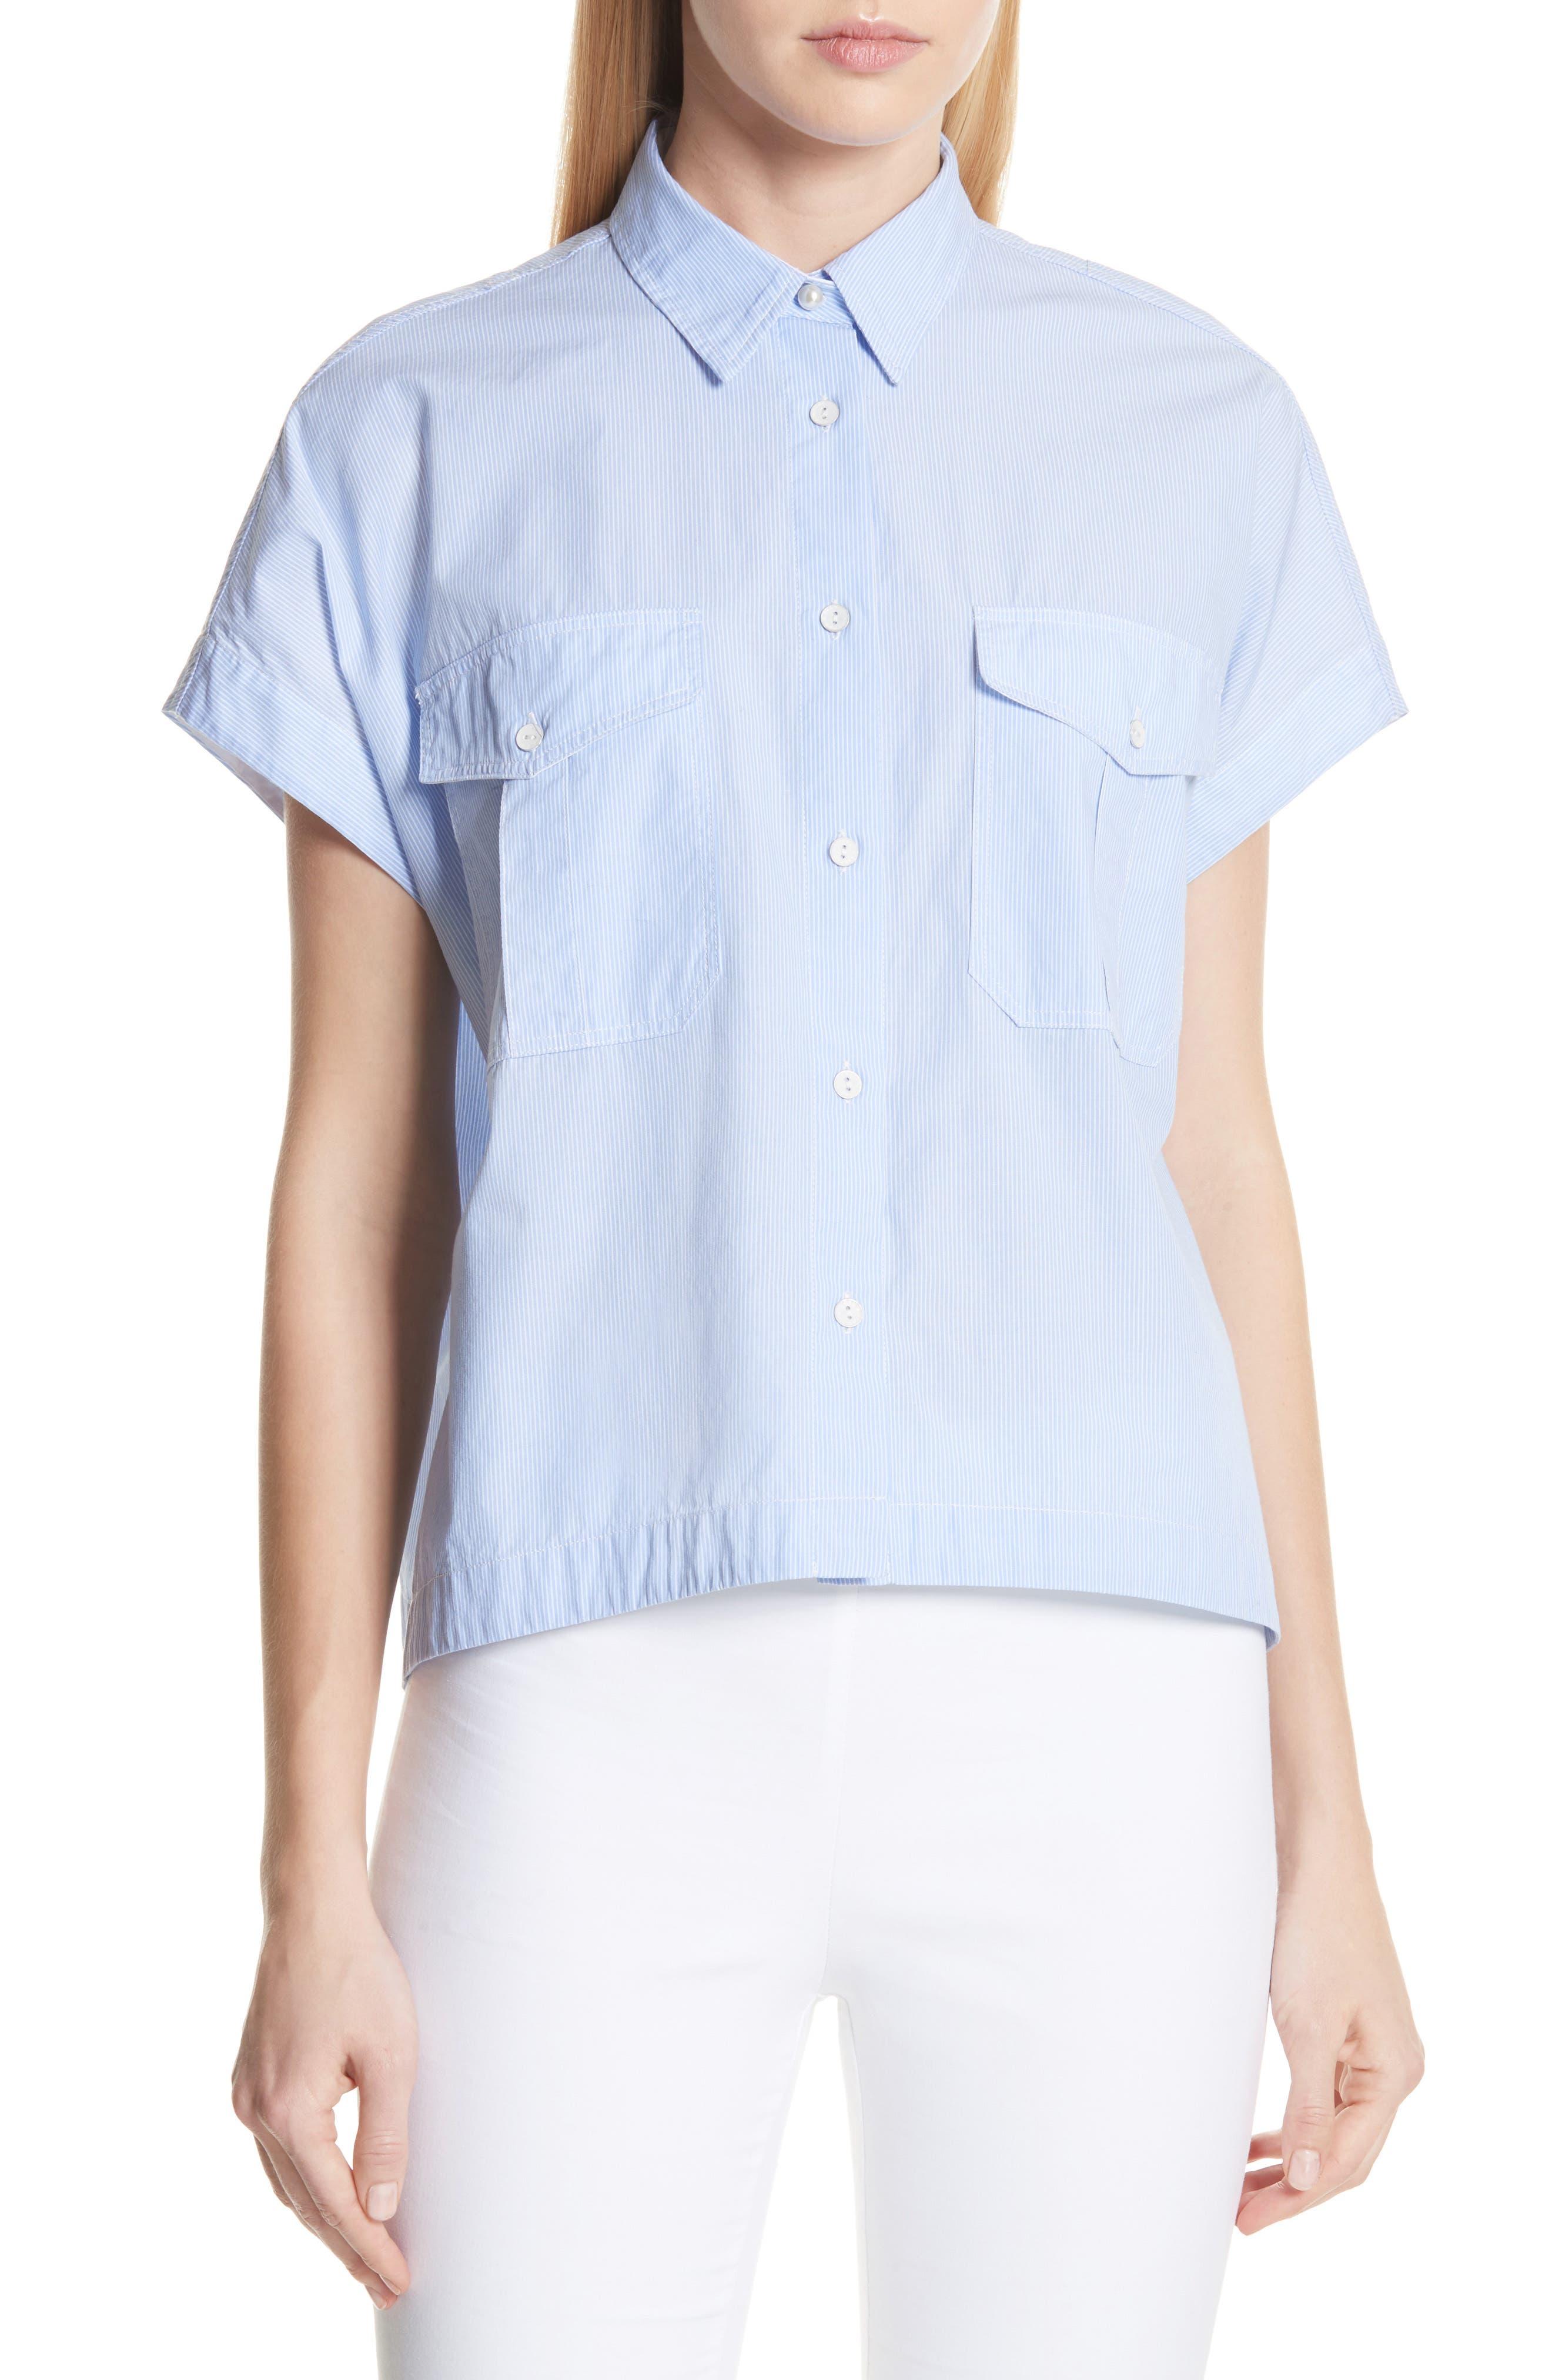 Pearson Shirt,                         Main,                         color, Light Blue Multi